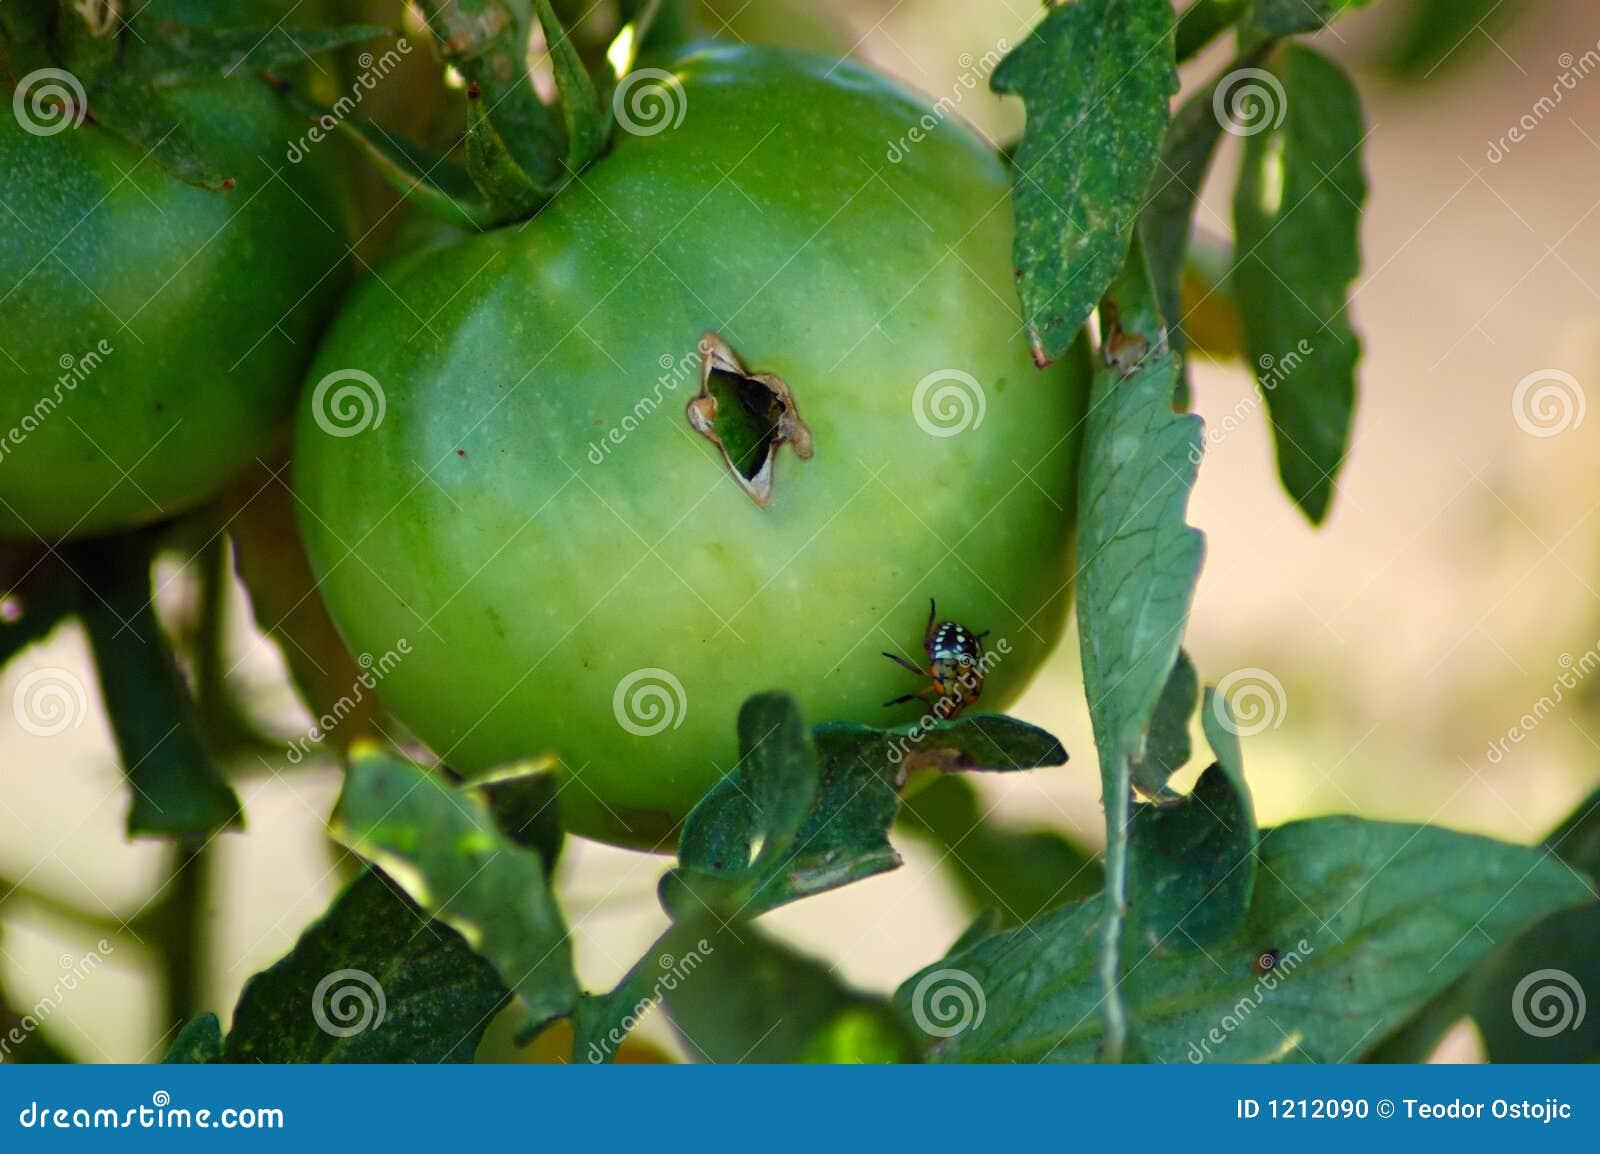 Parasite de tomate photo stock image 1212090 for Malattie pomodoro